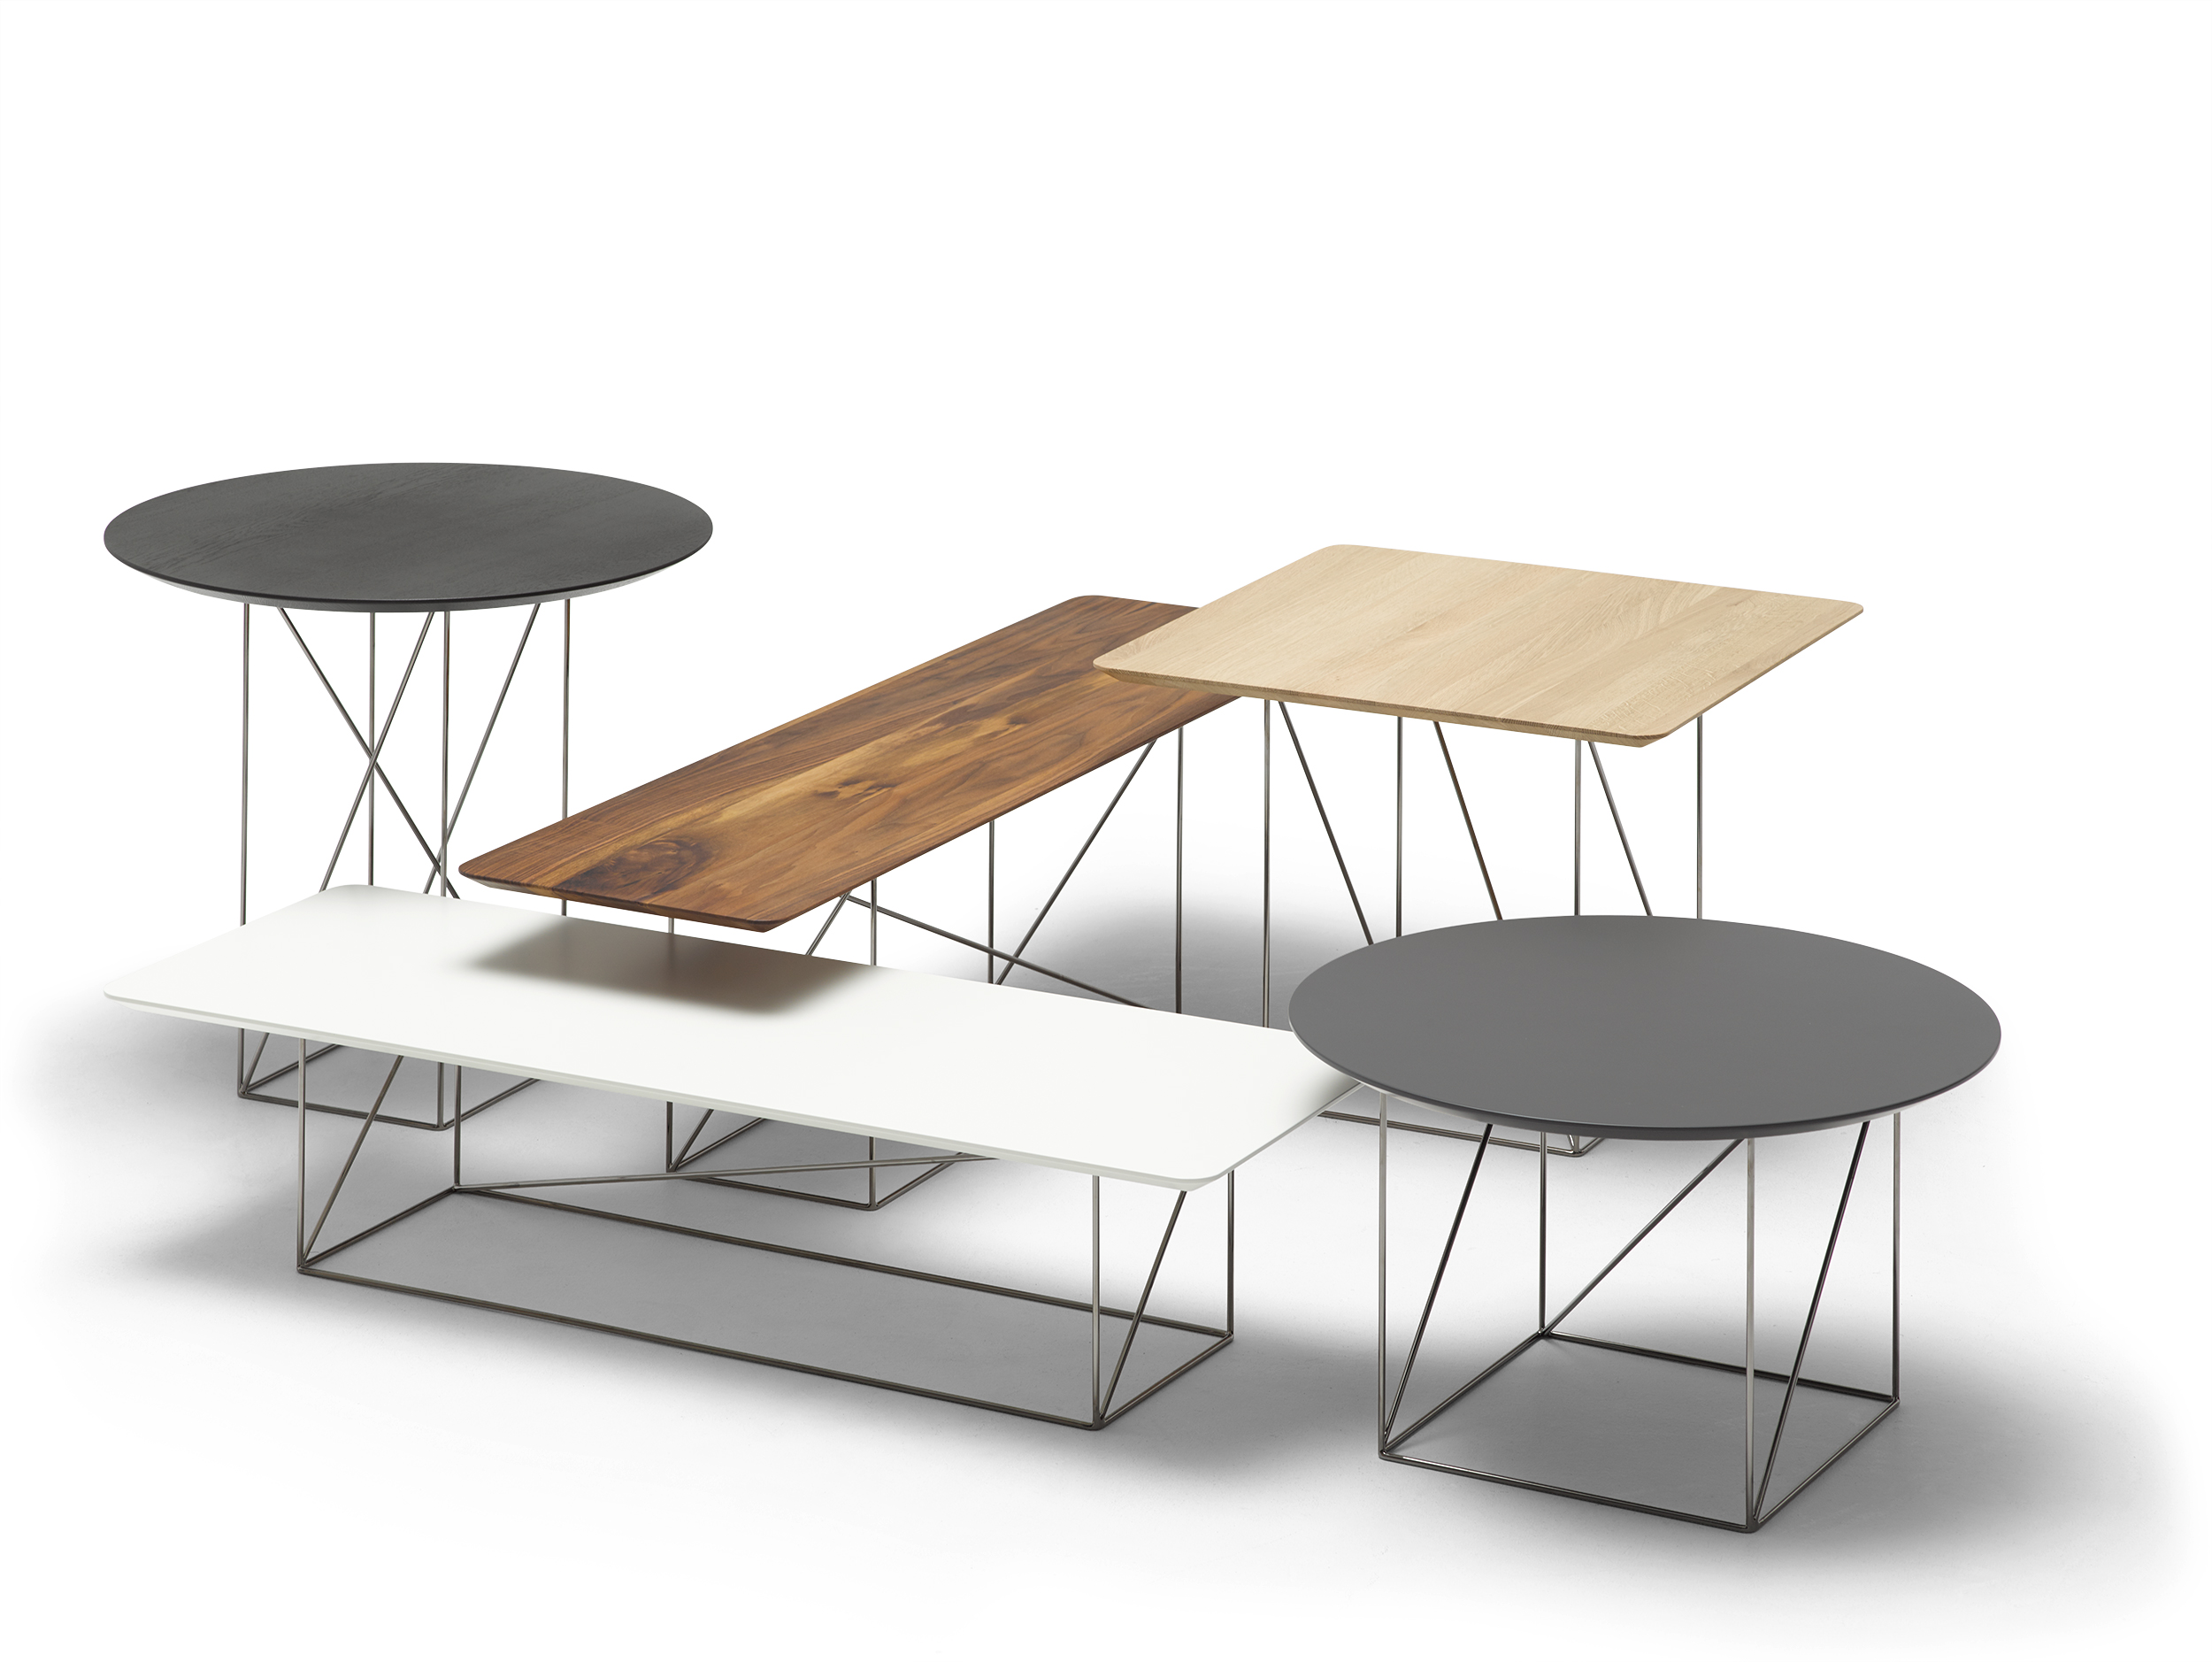 pilotis beistelltisch professional cor. Black Bedroom Furniture Sets. Home Design Ideas